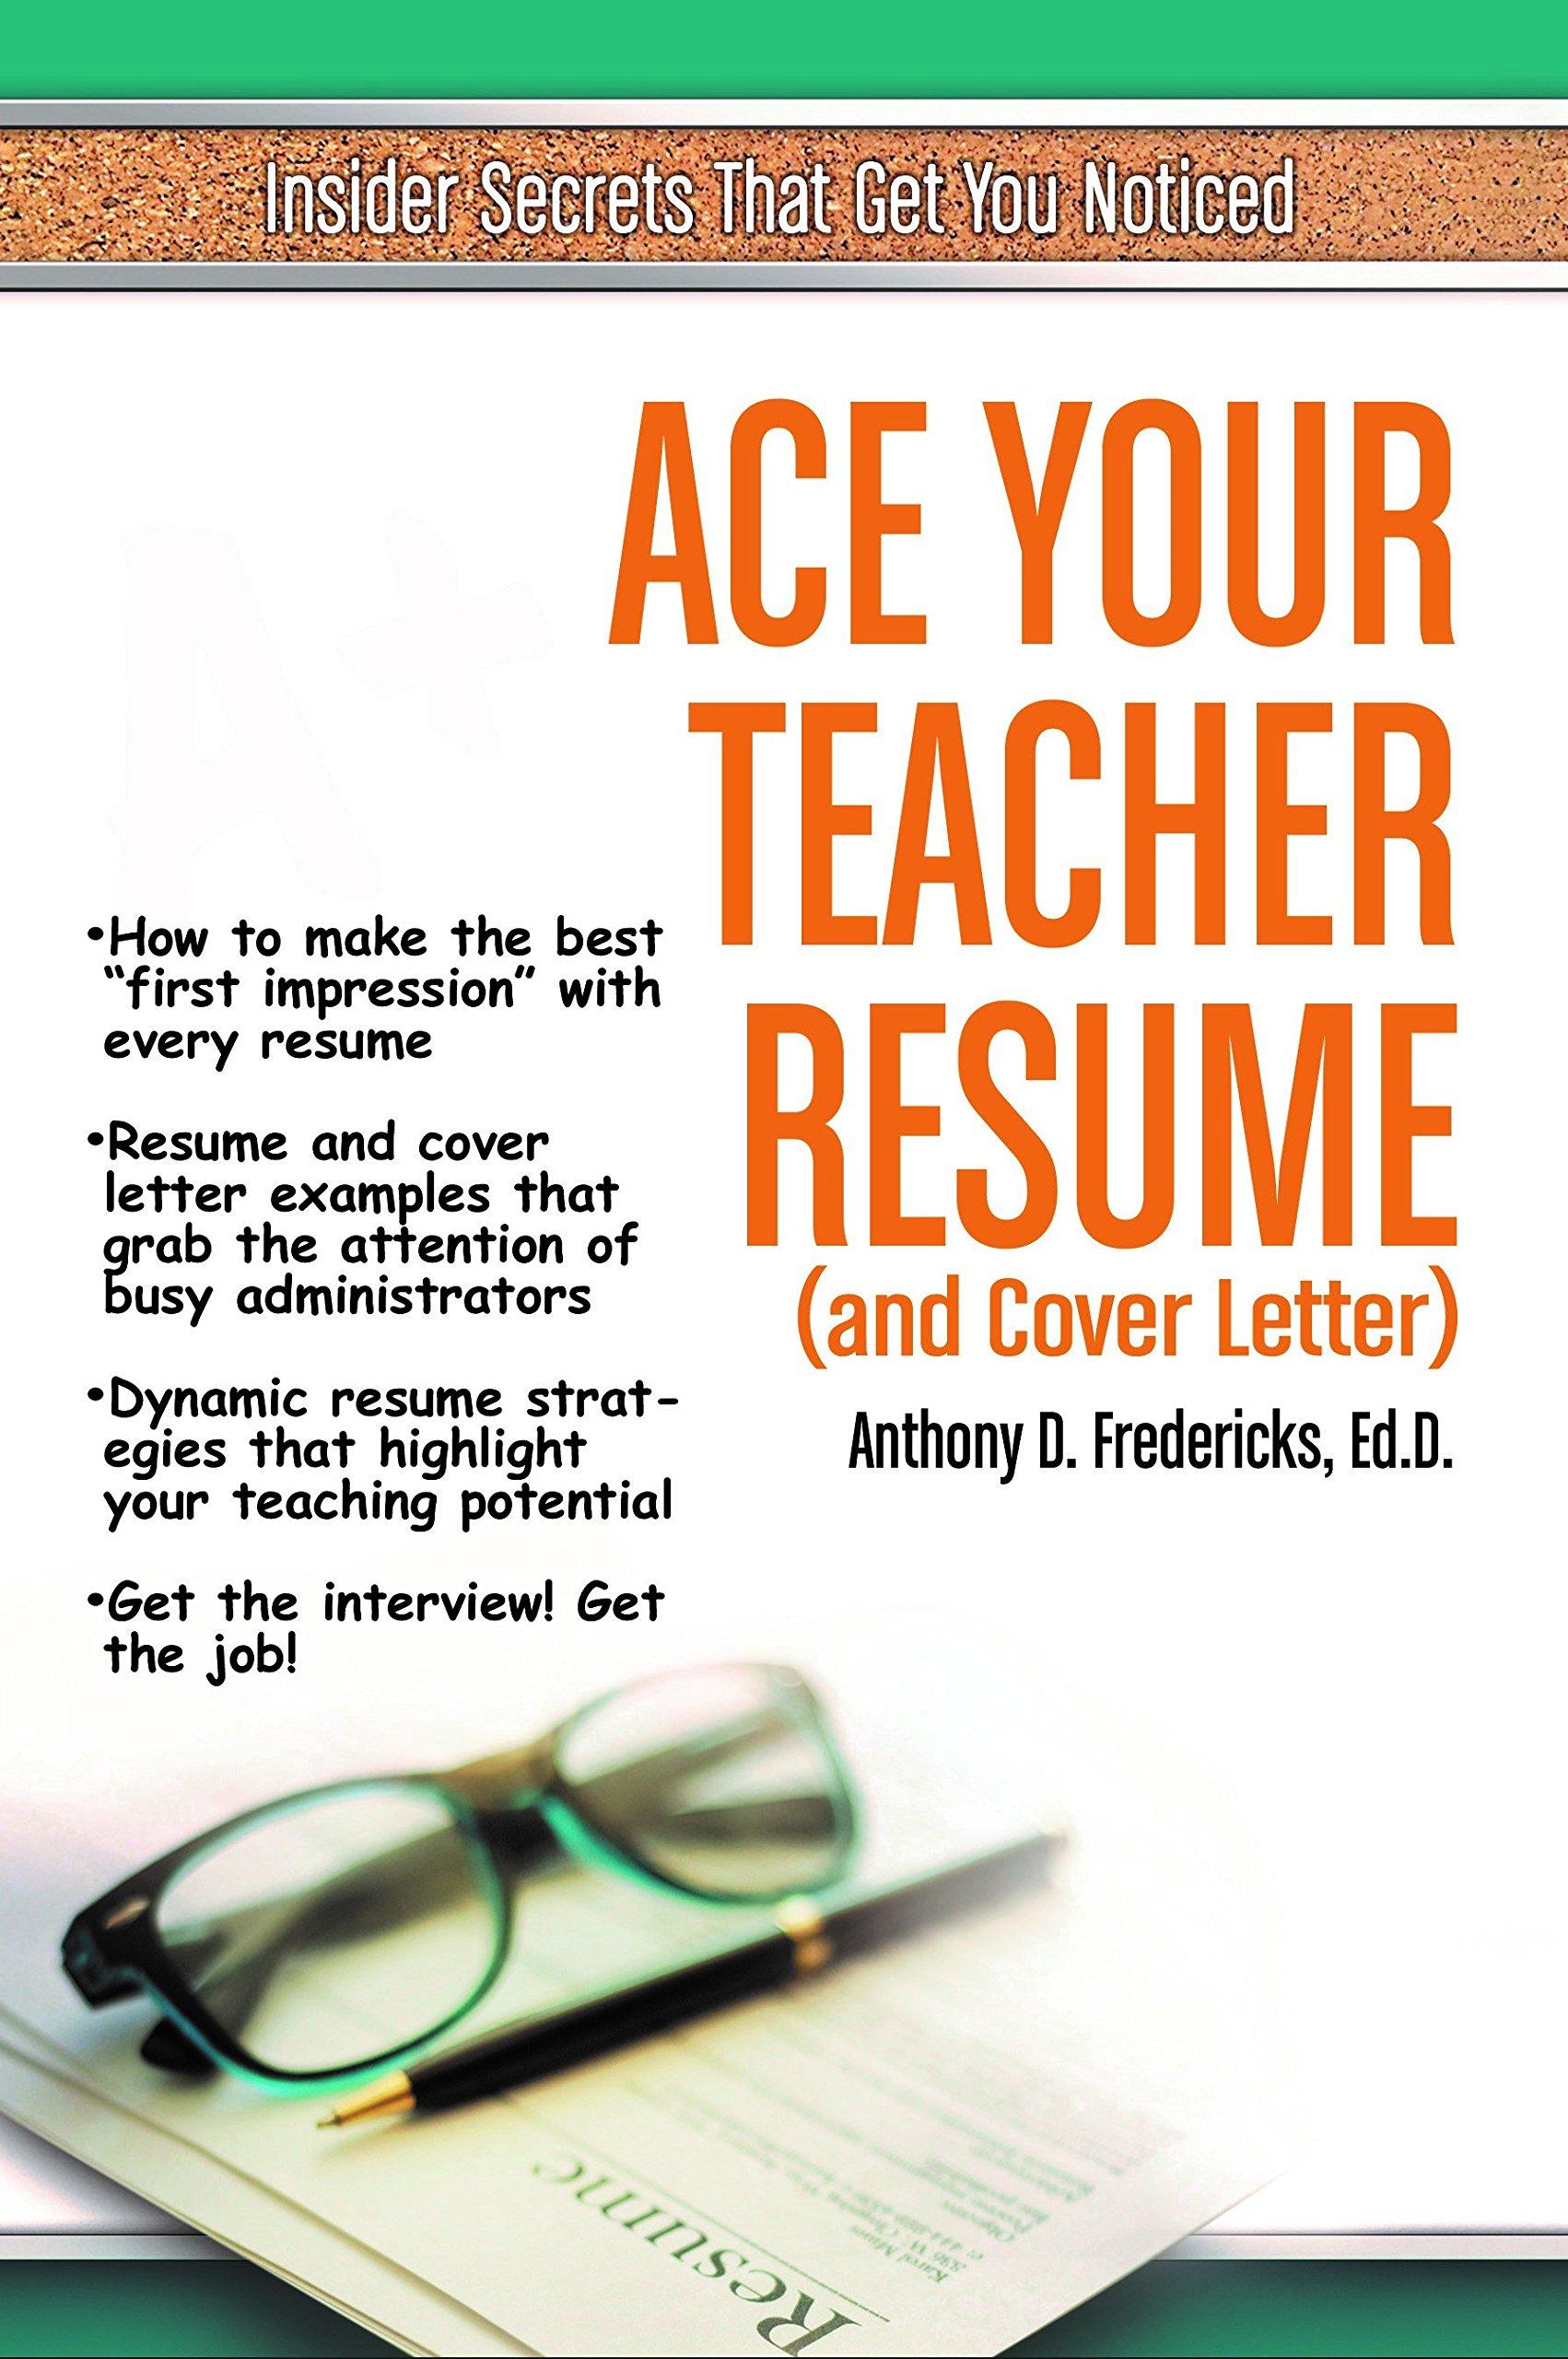 Ace Your Teacher Resume.jpg